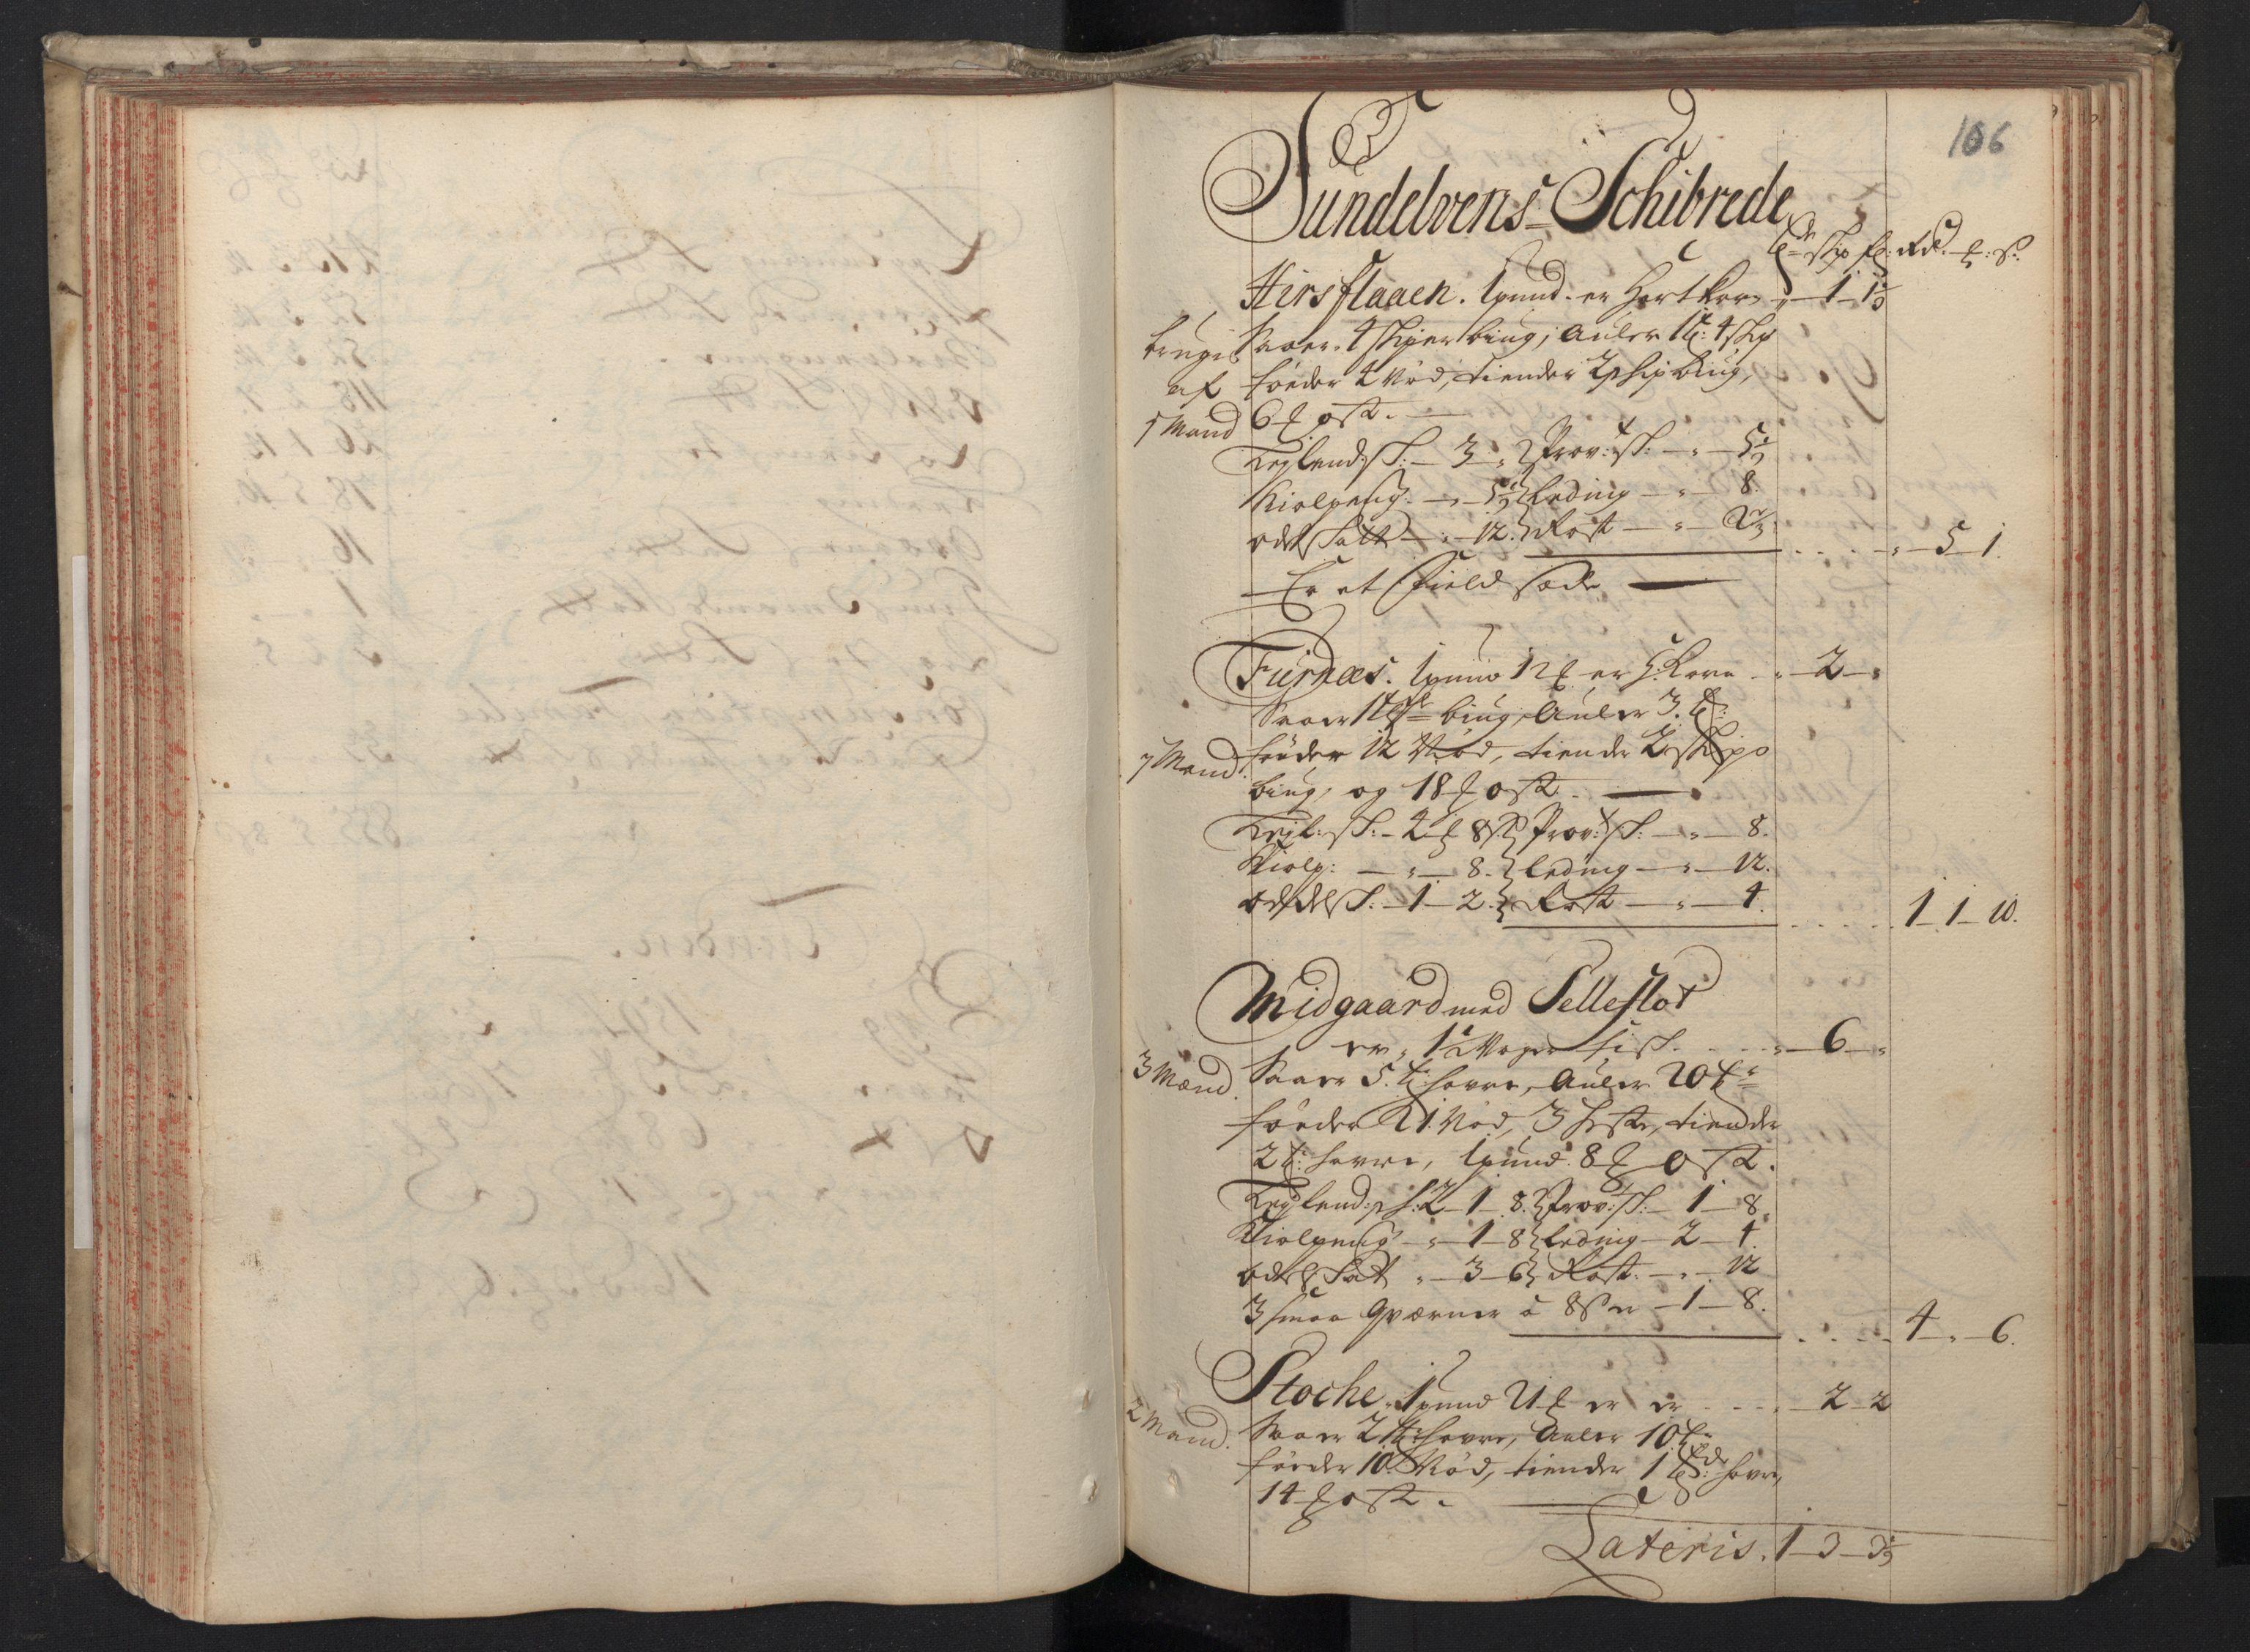 RA, Rentekammeret inntil 1814, Realistisk ordnet avdeling, N/Nb/Nbf/L0148: Sunnmøre, prøvematrikkel, 1714, s. 105b-106a